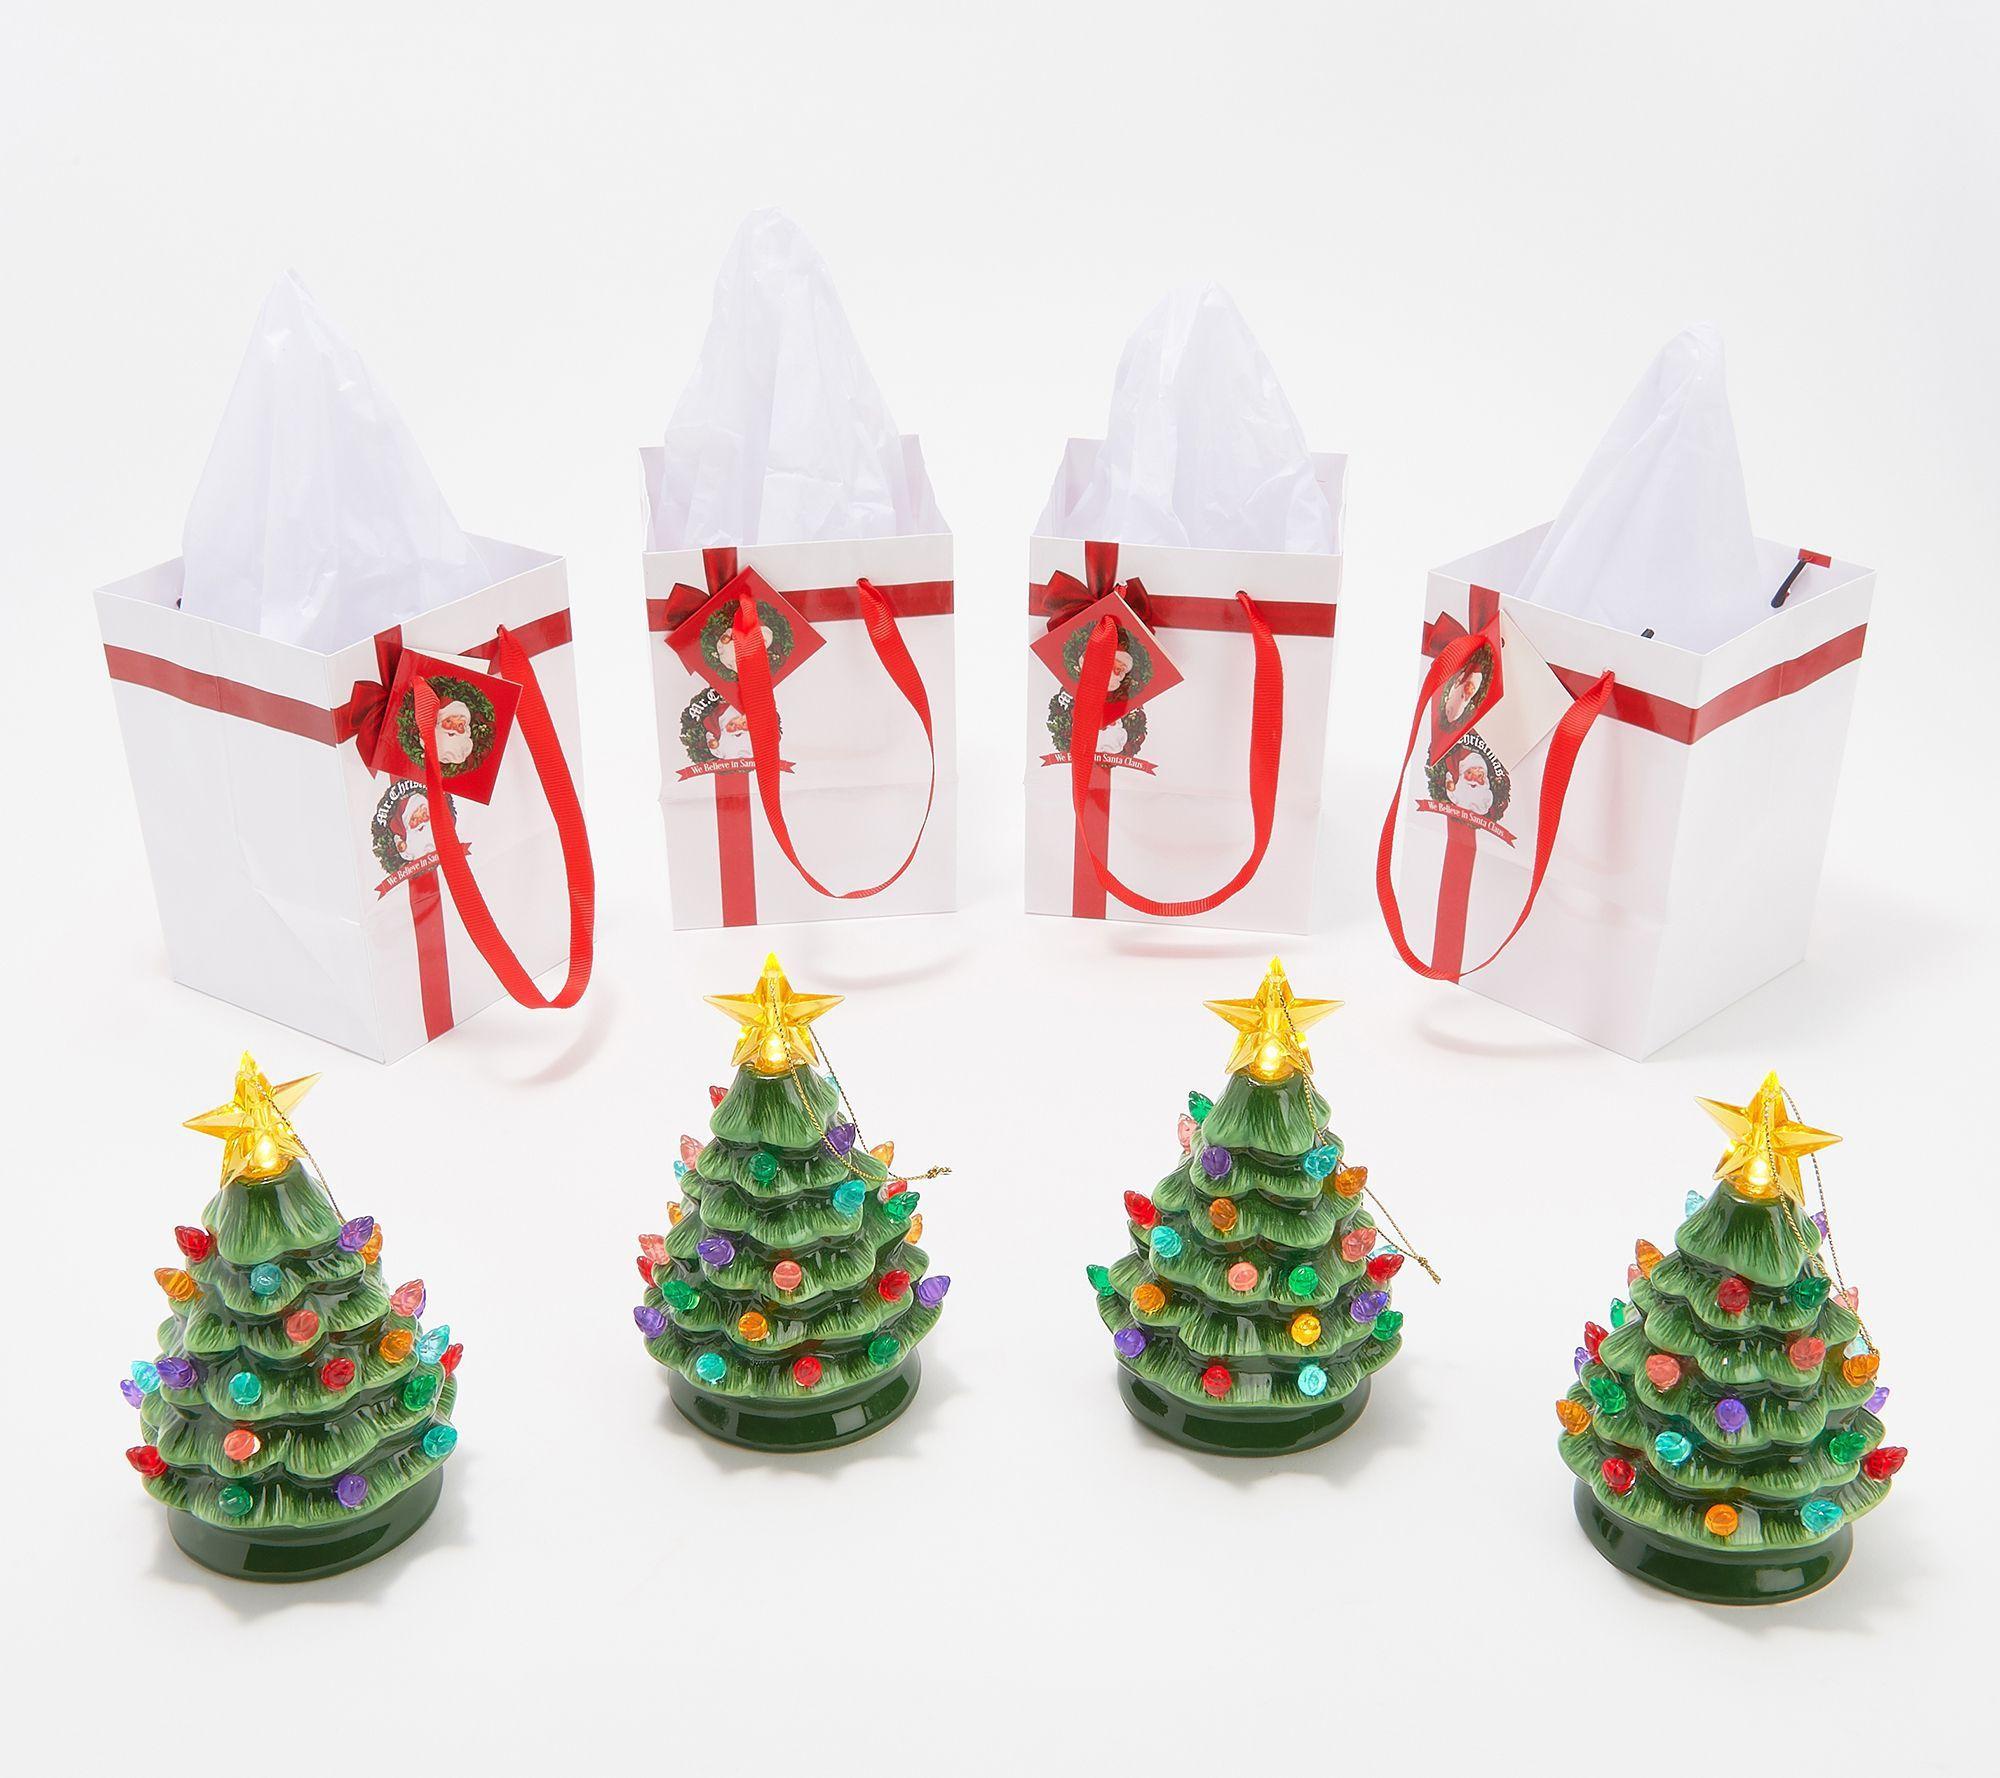 Mr Christmas Set Of 4 Lit Nostalgic Tree Ornaments With Gift Bags Qvc Com Christmas Settings Mr Christmas Tree Ornaments